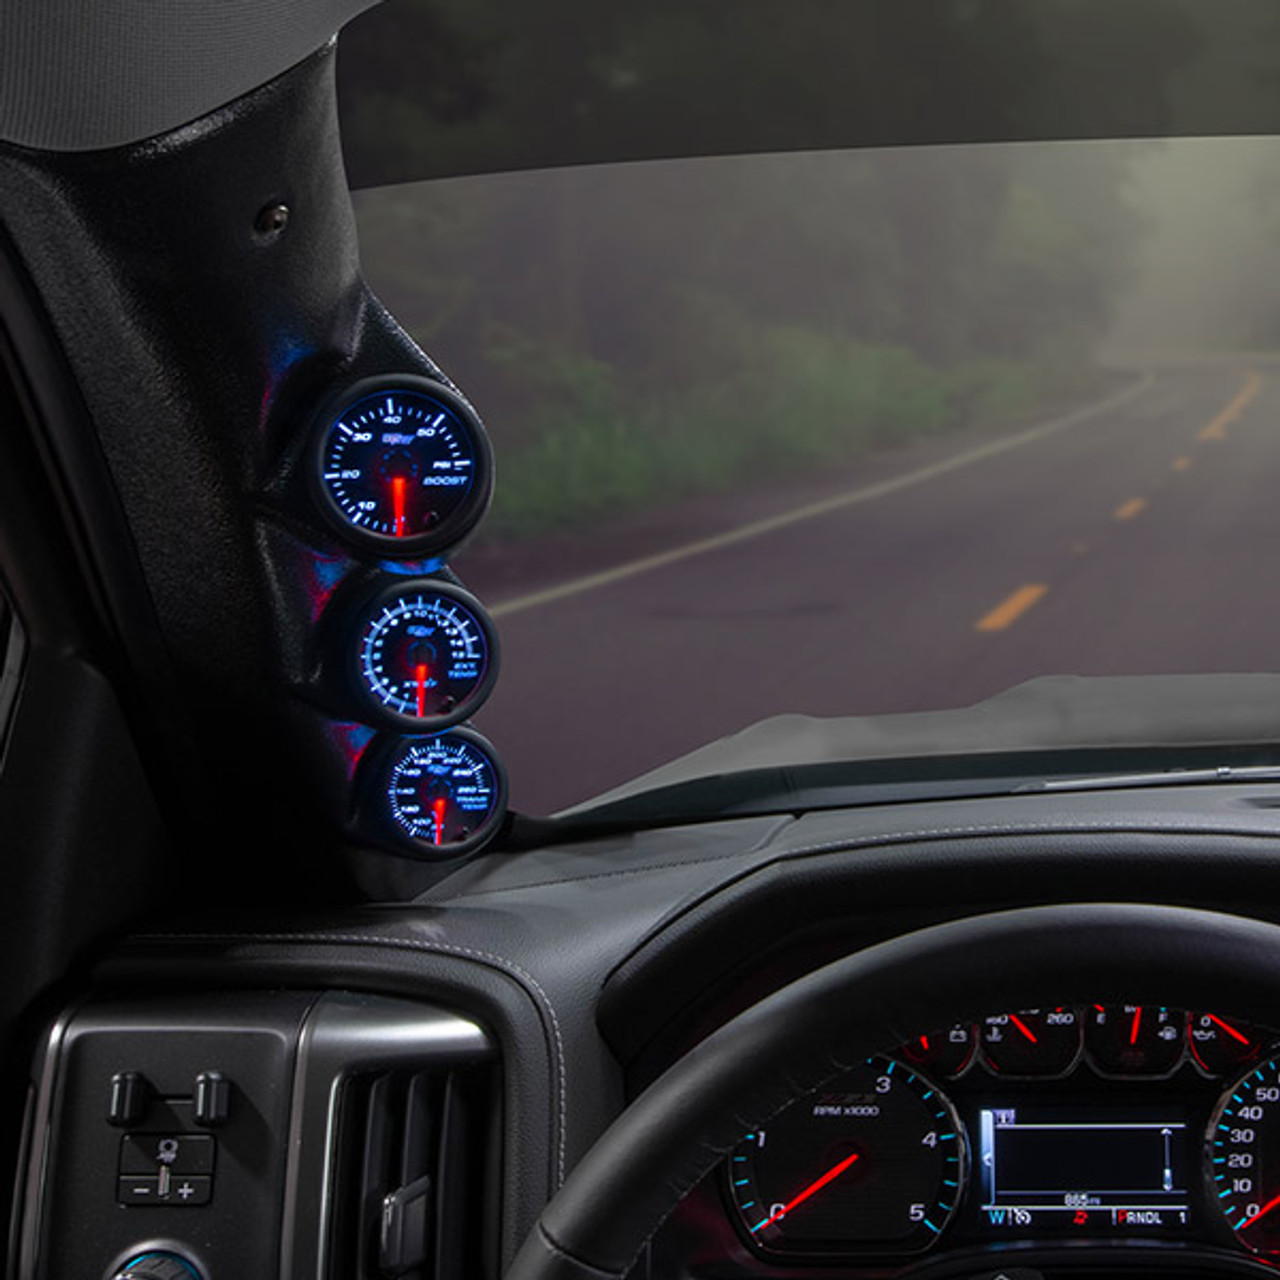 2014-2019 Chevy Silverado Duramax Custom 7 Color Series Gauge Package | Chevrolet Silverado Lmm Fuel Gauge Wiring |  | GlowShift